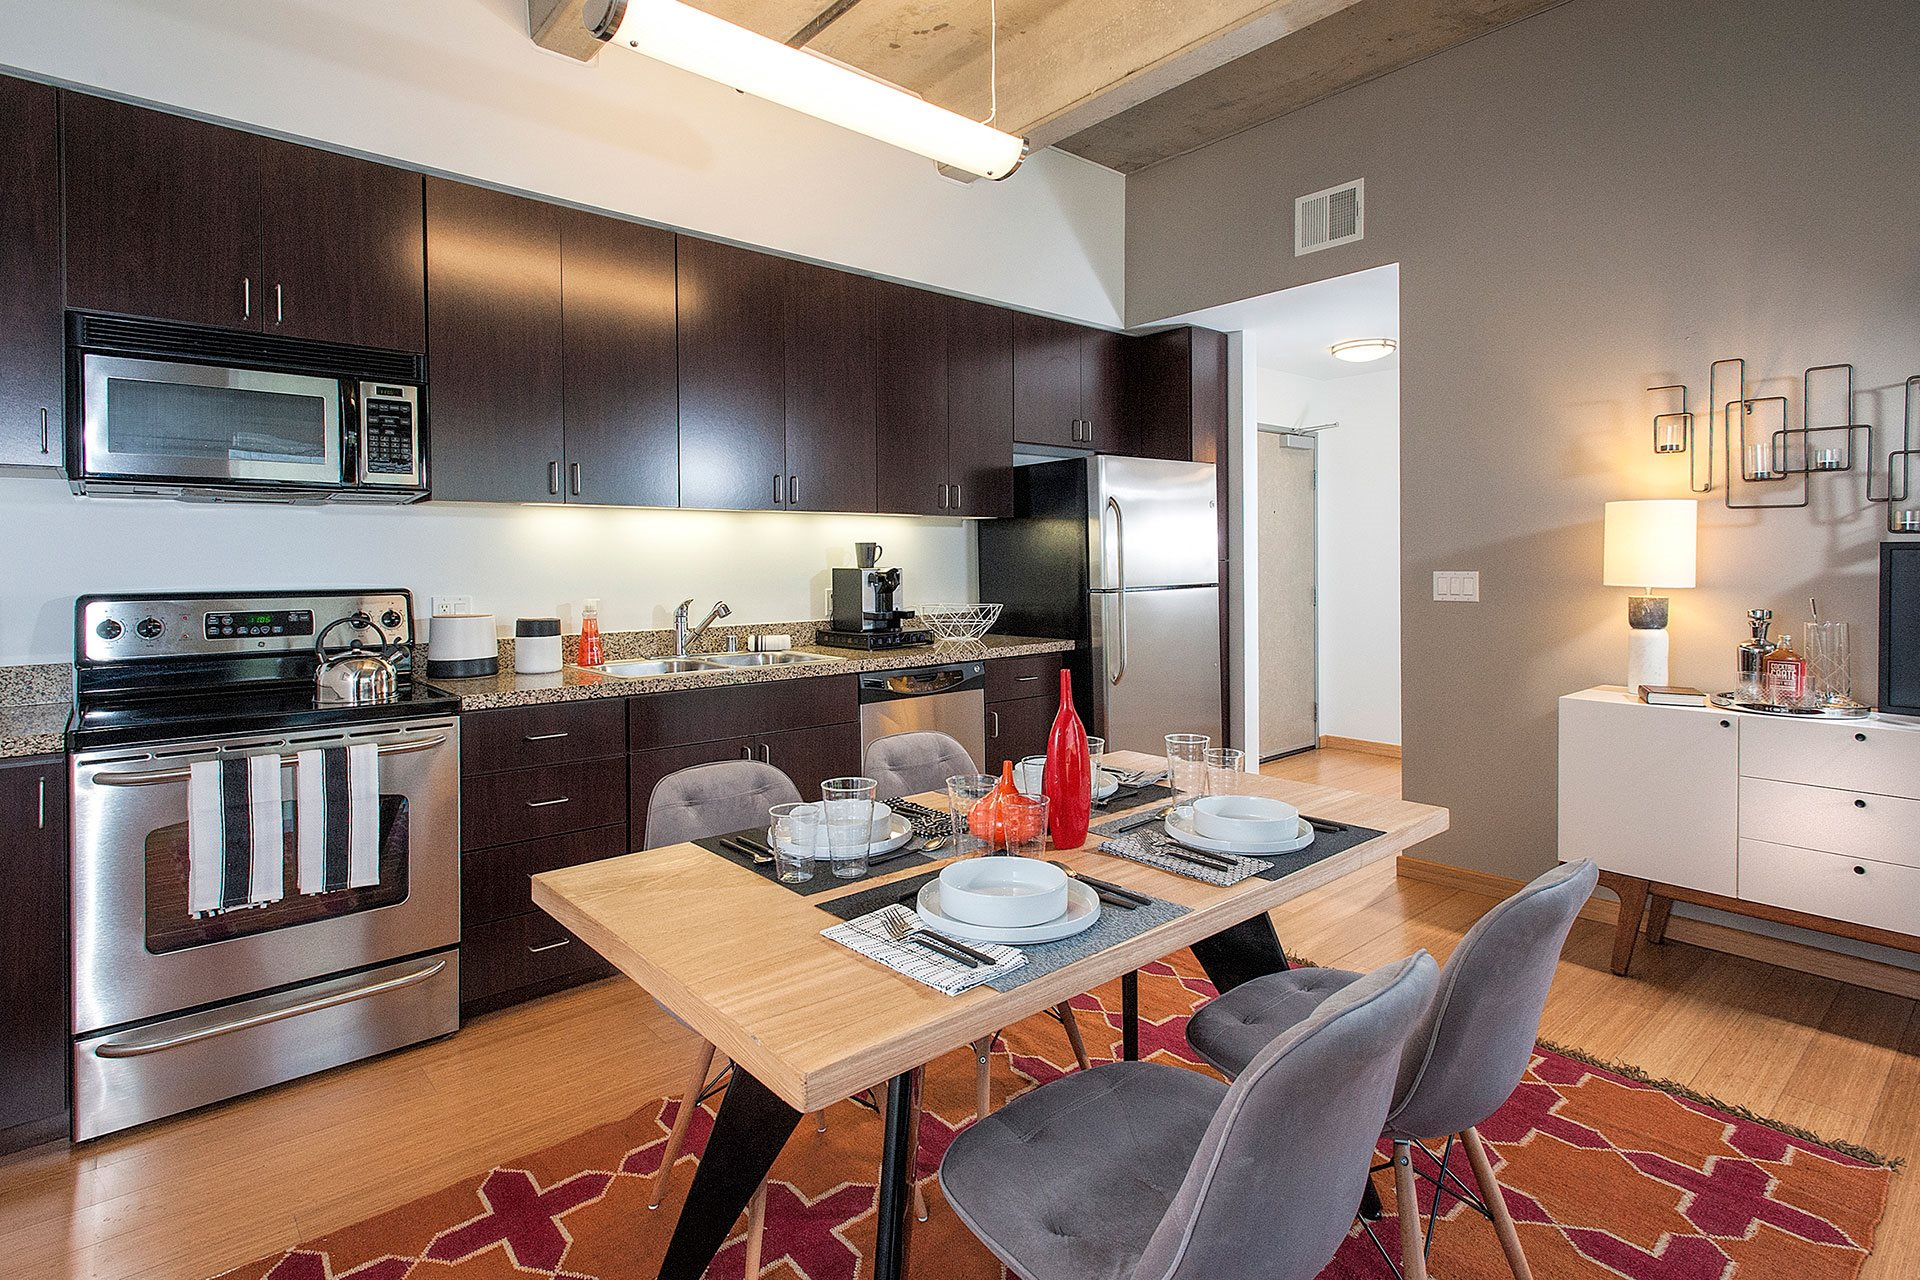 Gourmet Kitchens with Granite Countertops